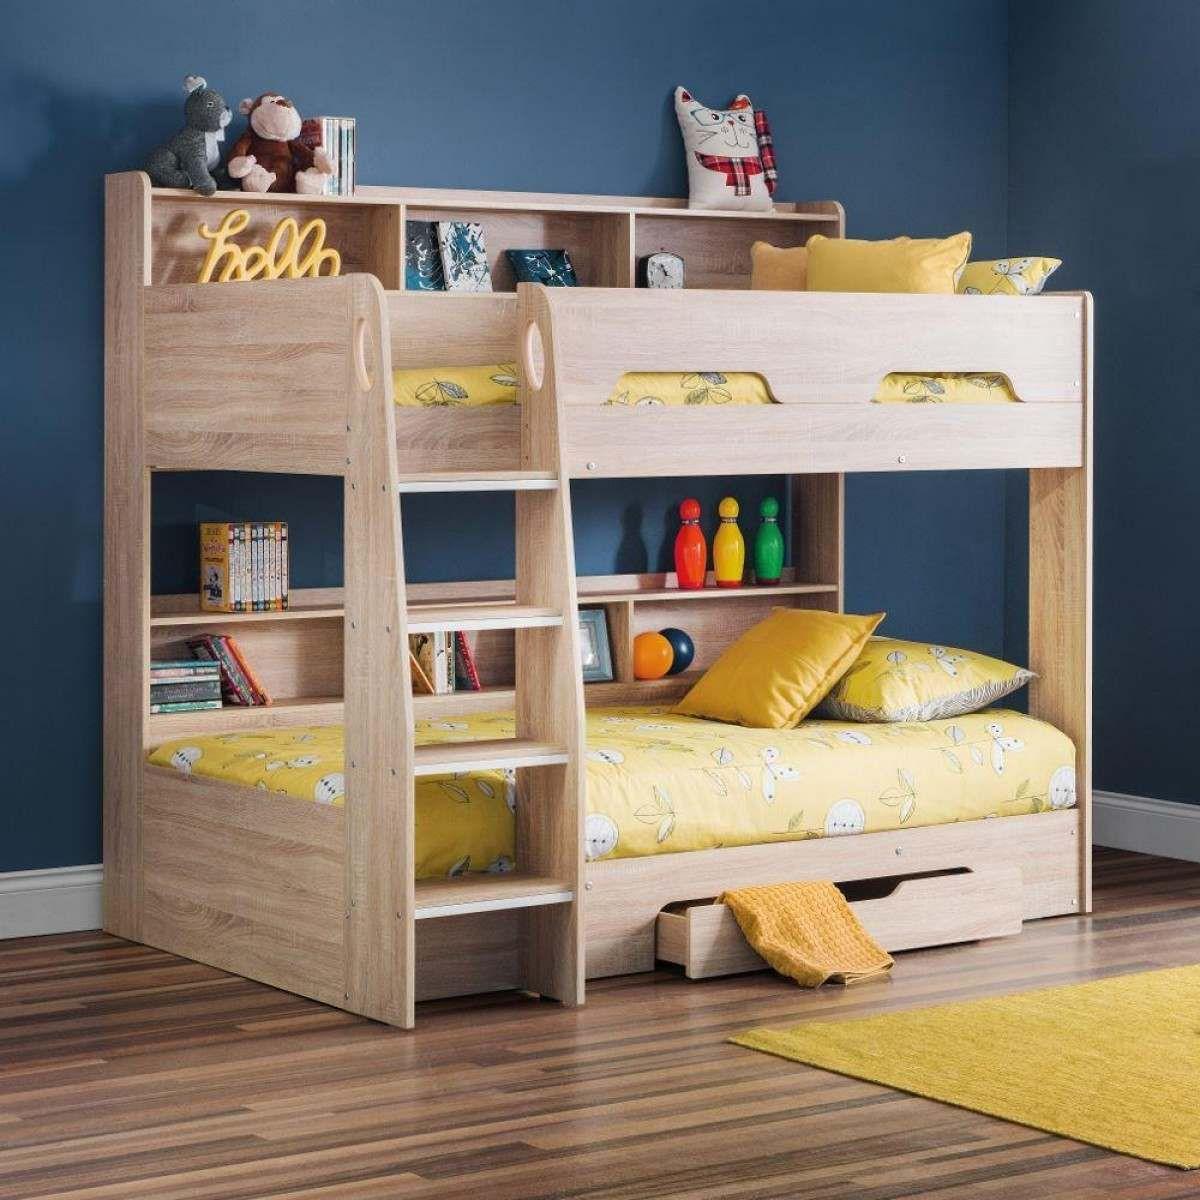 Best Orion Oak Wooden Storage Bunk Bed Bunk Beds With Storage 400 x 300